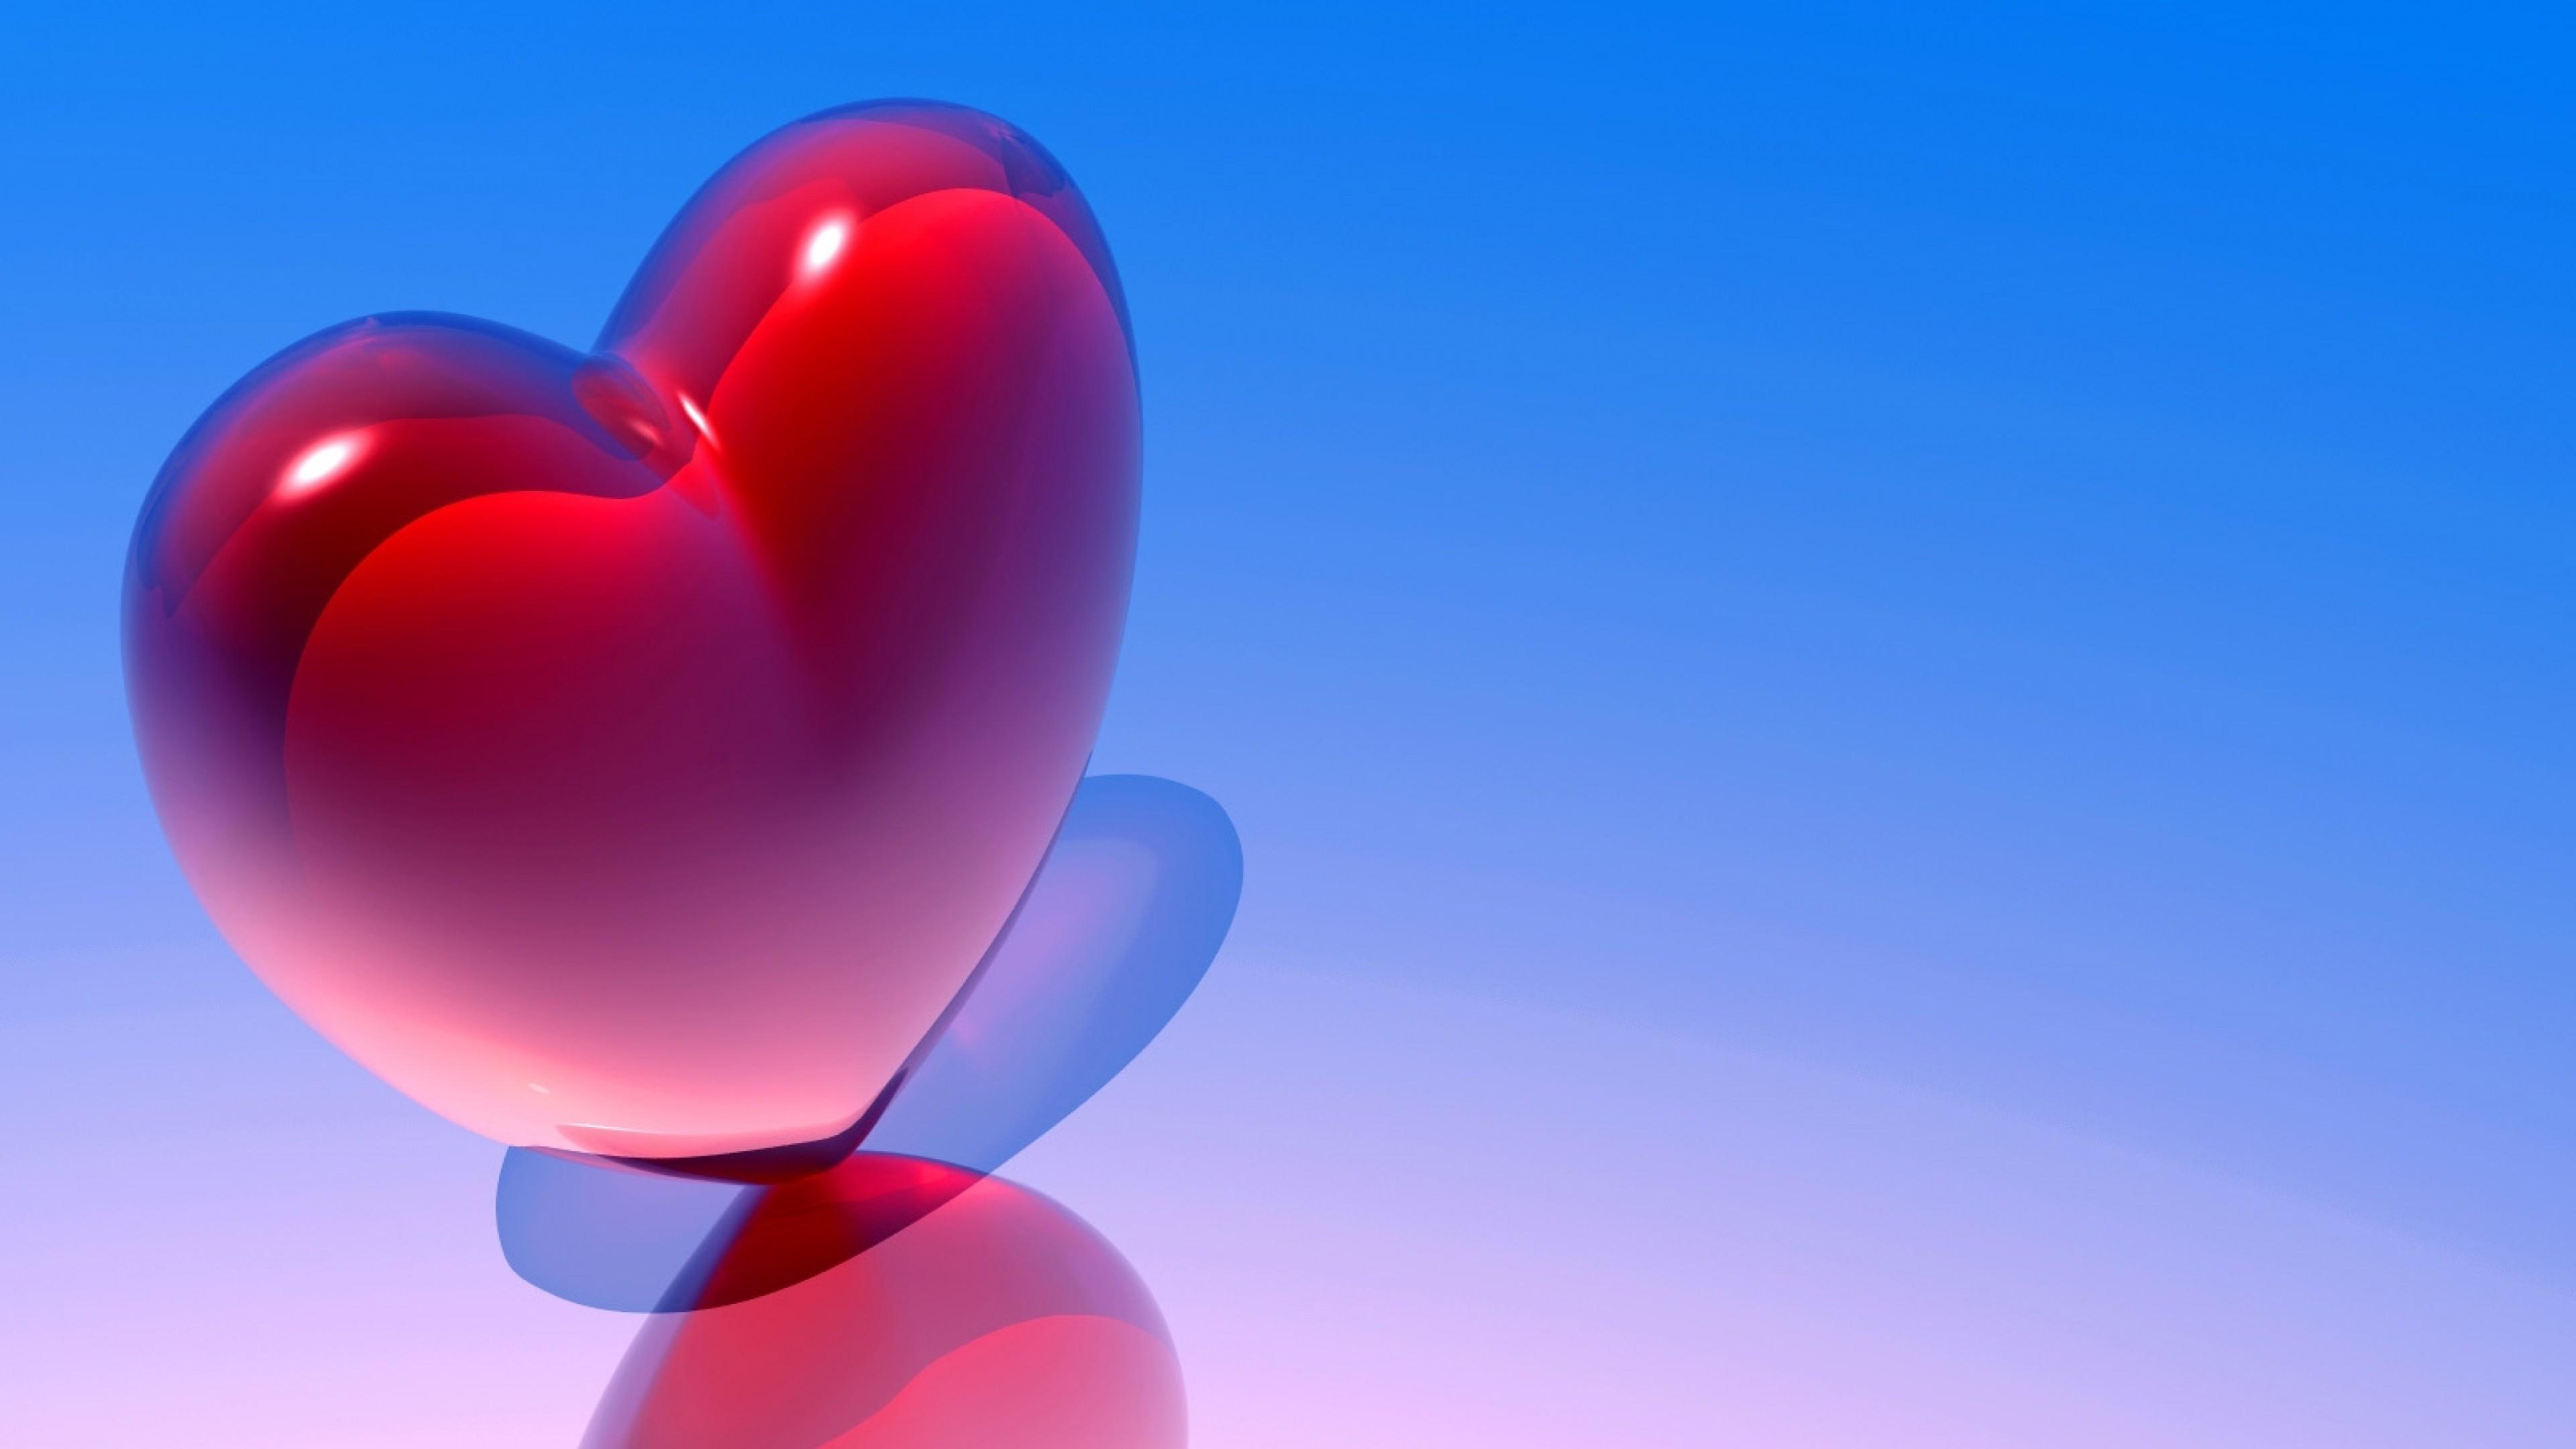 Love Heart Wallpaper Hd Wallpapertag: Heart Love Wallpaper Images ·① WallpaperTag